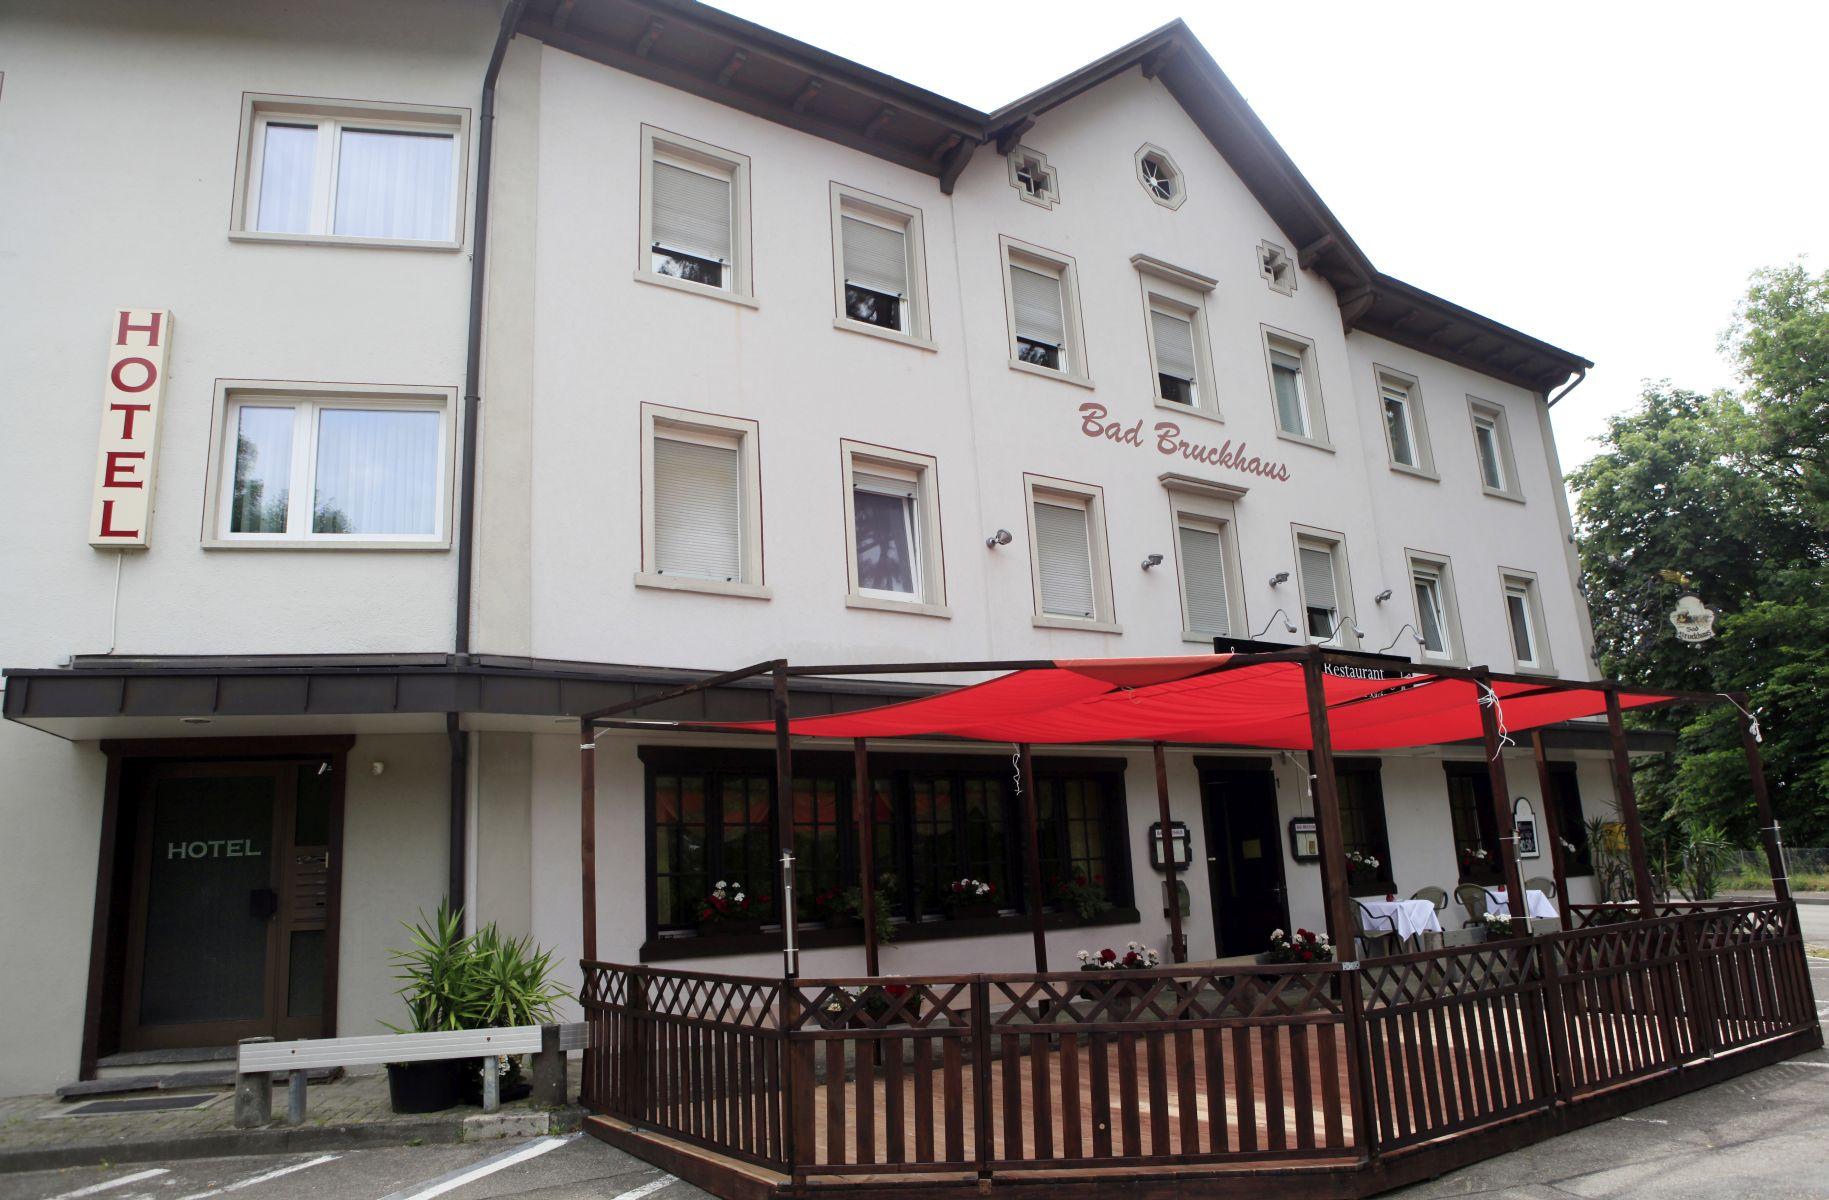 Hotel_Bad_Bruckhaus